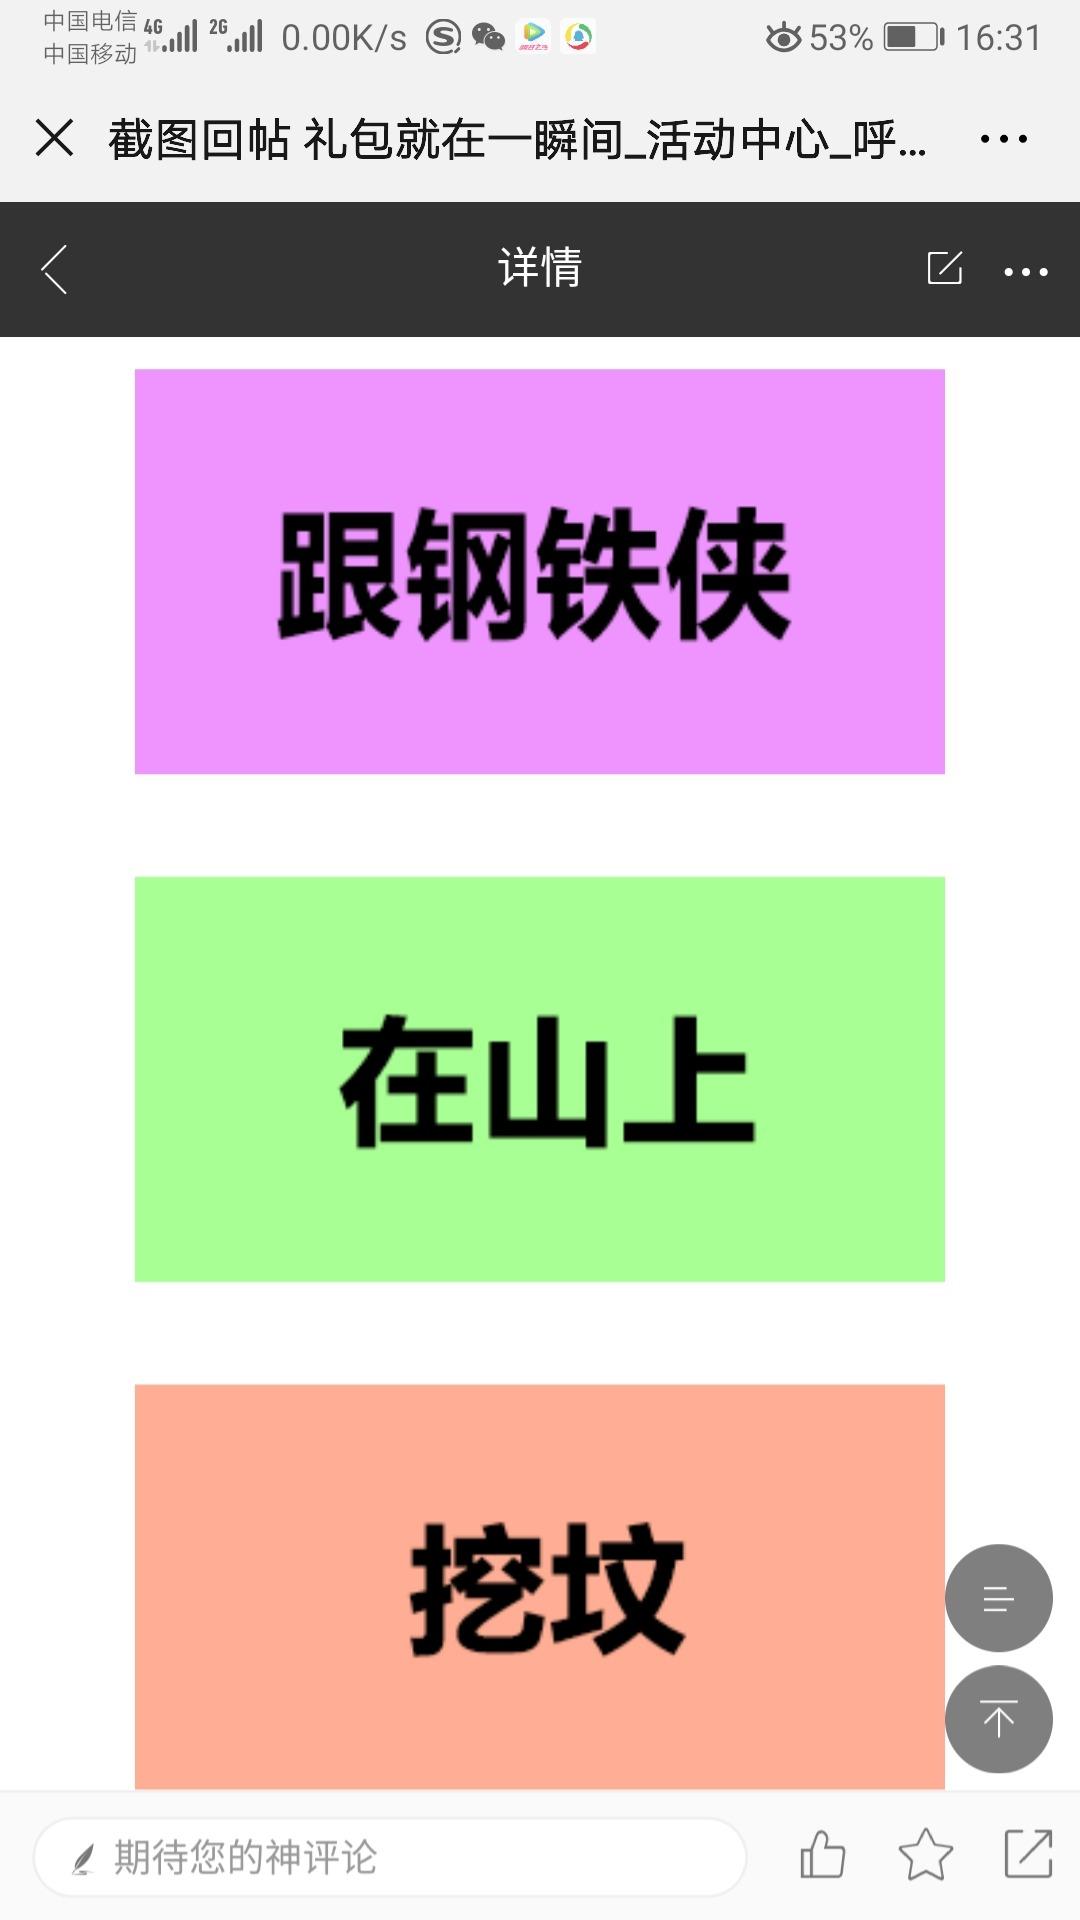 Screenshot_20190725_163128_com.tencent.mm.jpg